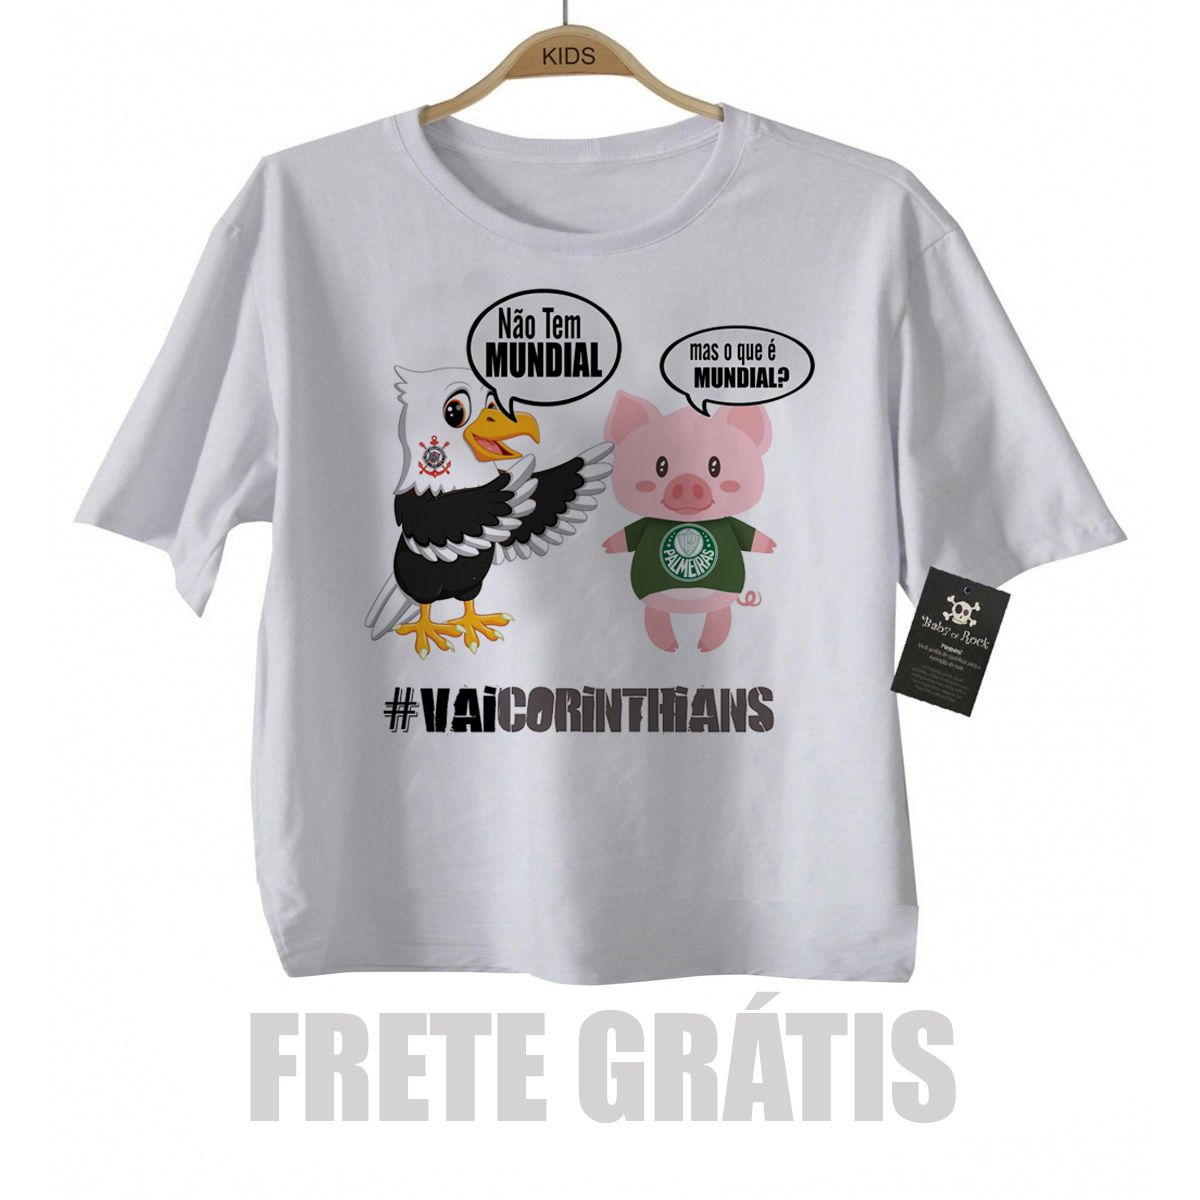 Camiseta Infantl VAI CORINTHIANS Time-  Palmeiras sem Mundial - White  - Baby Monster S/A